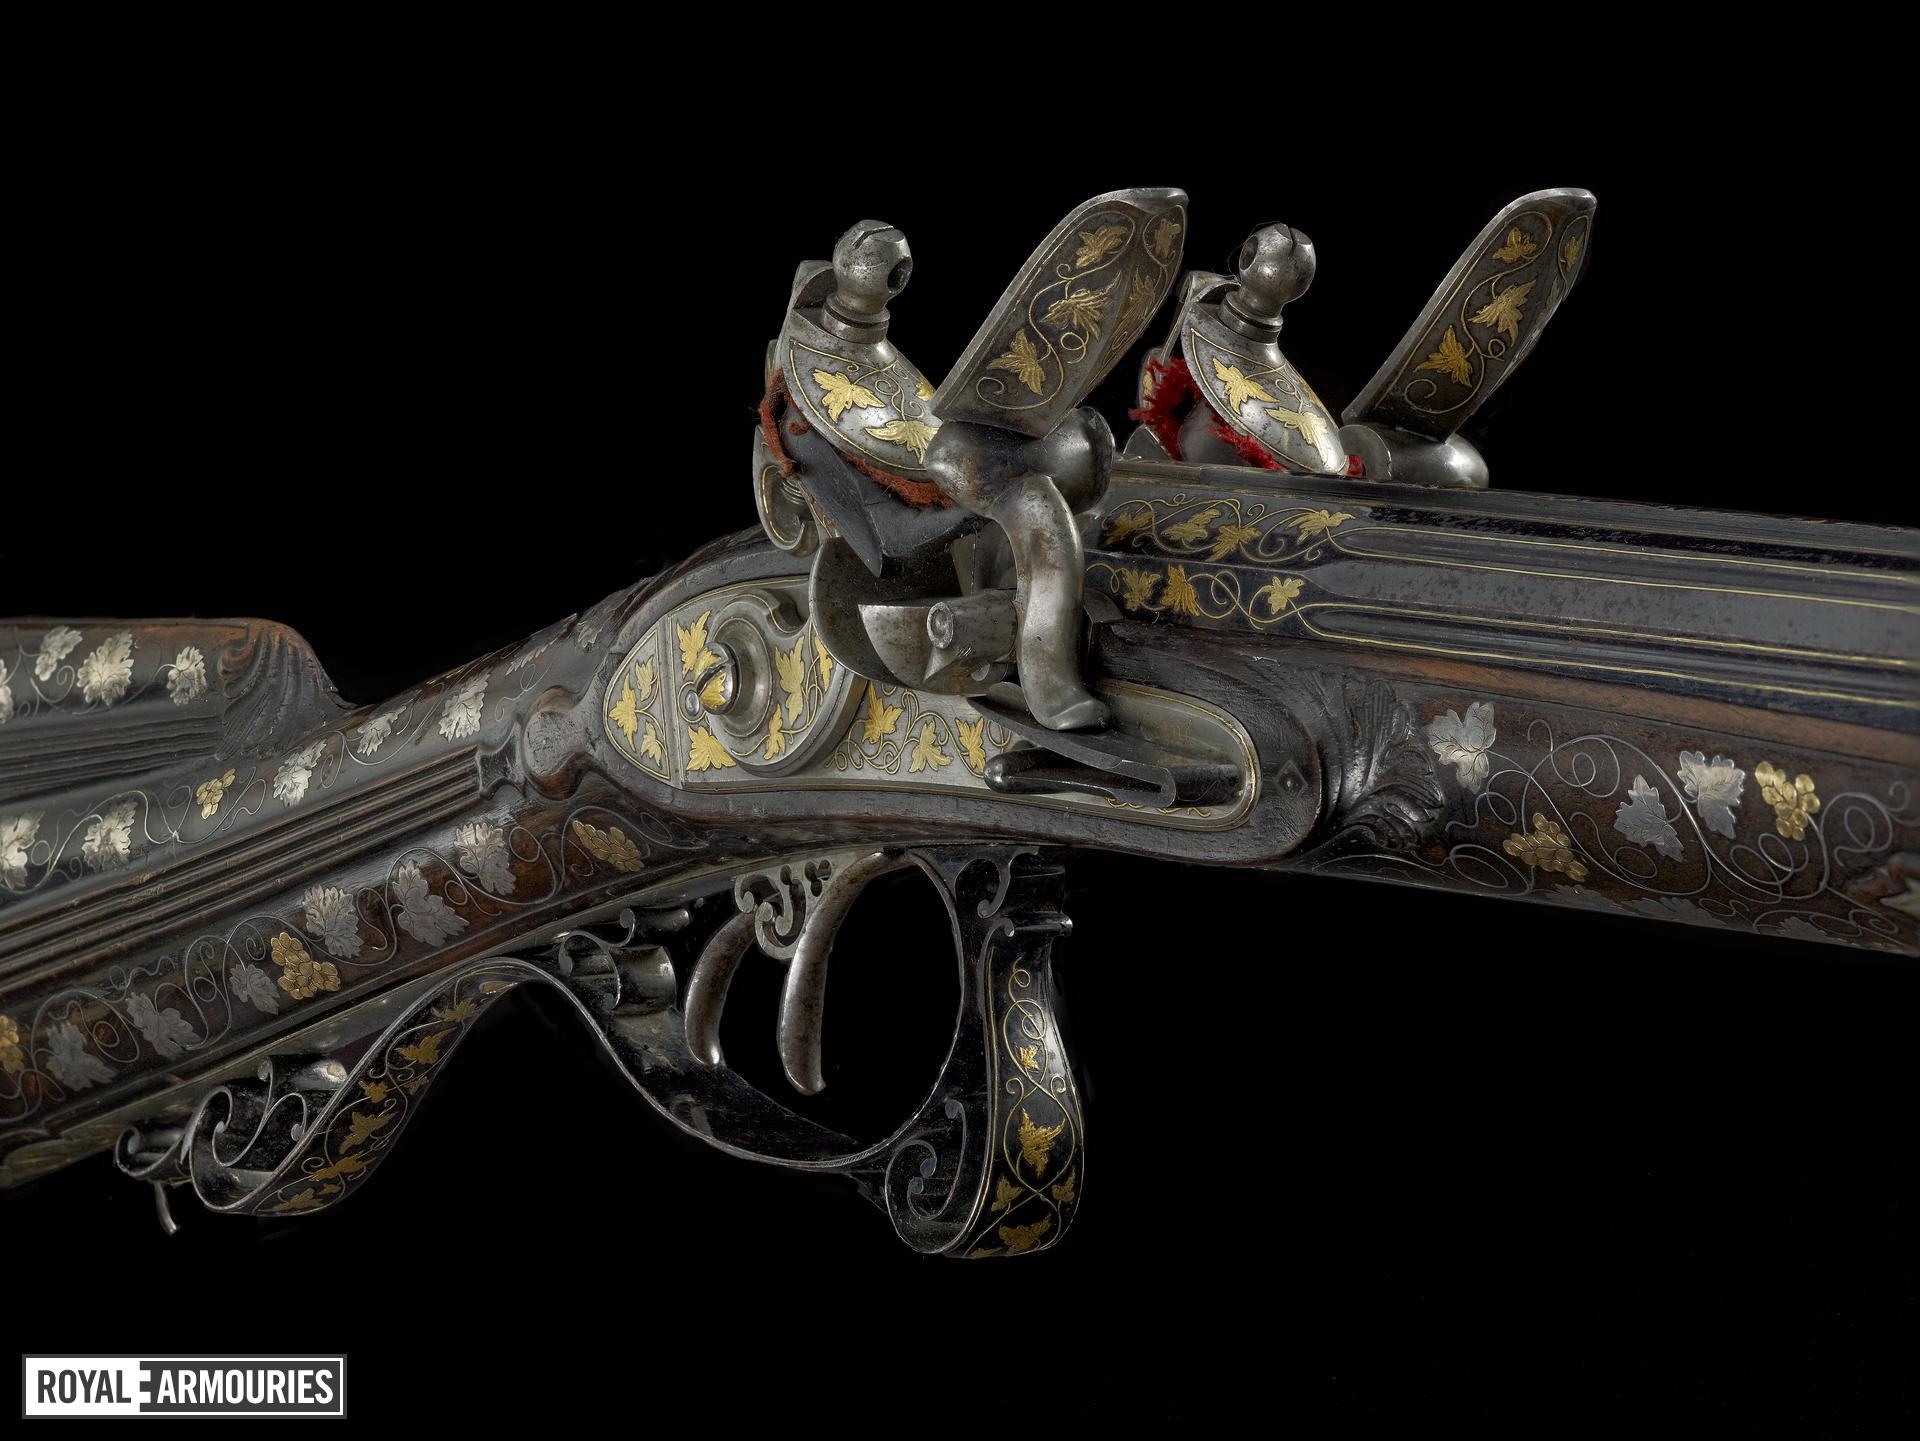 Flintlock muzzle-loading double-barrelled shotgun - By Zaoue